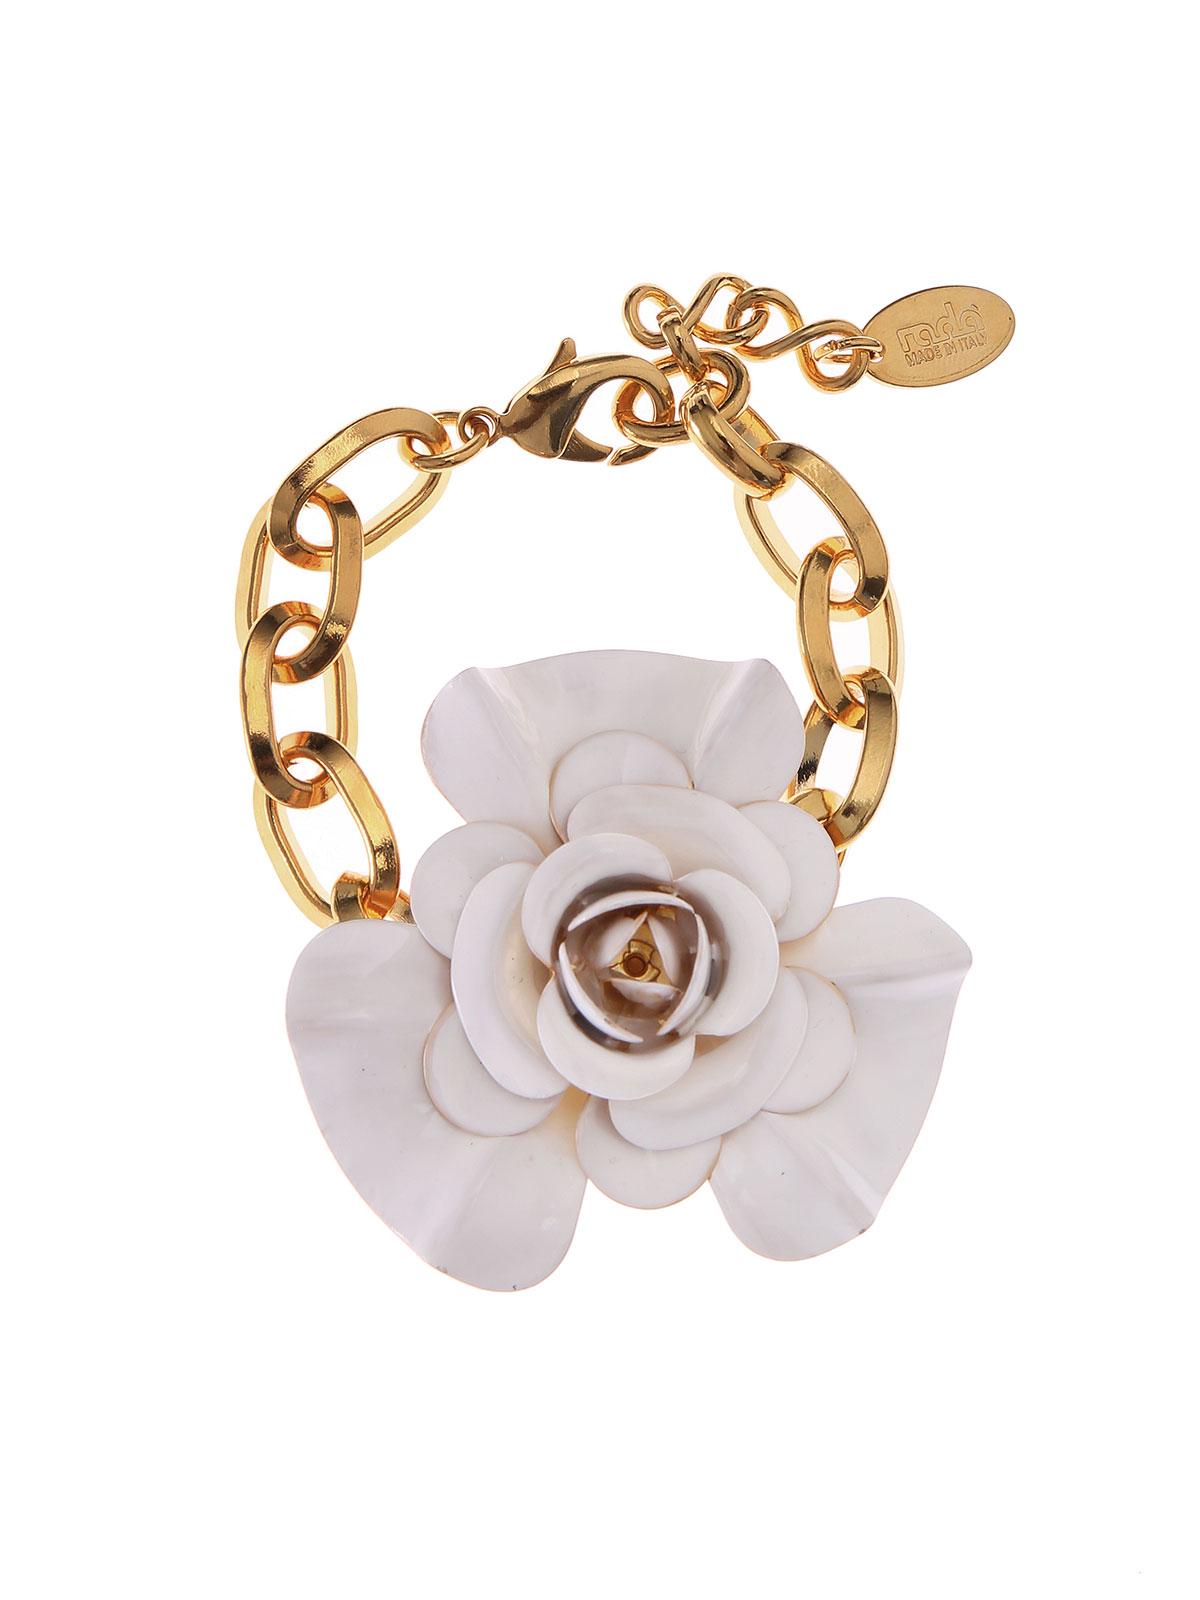 Bracelet with enamelled flower